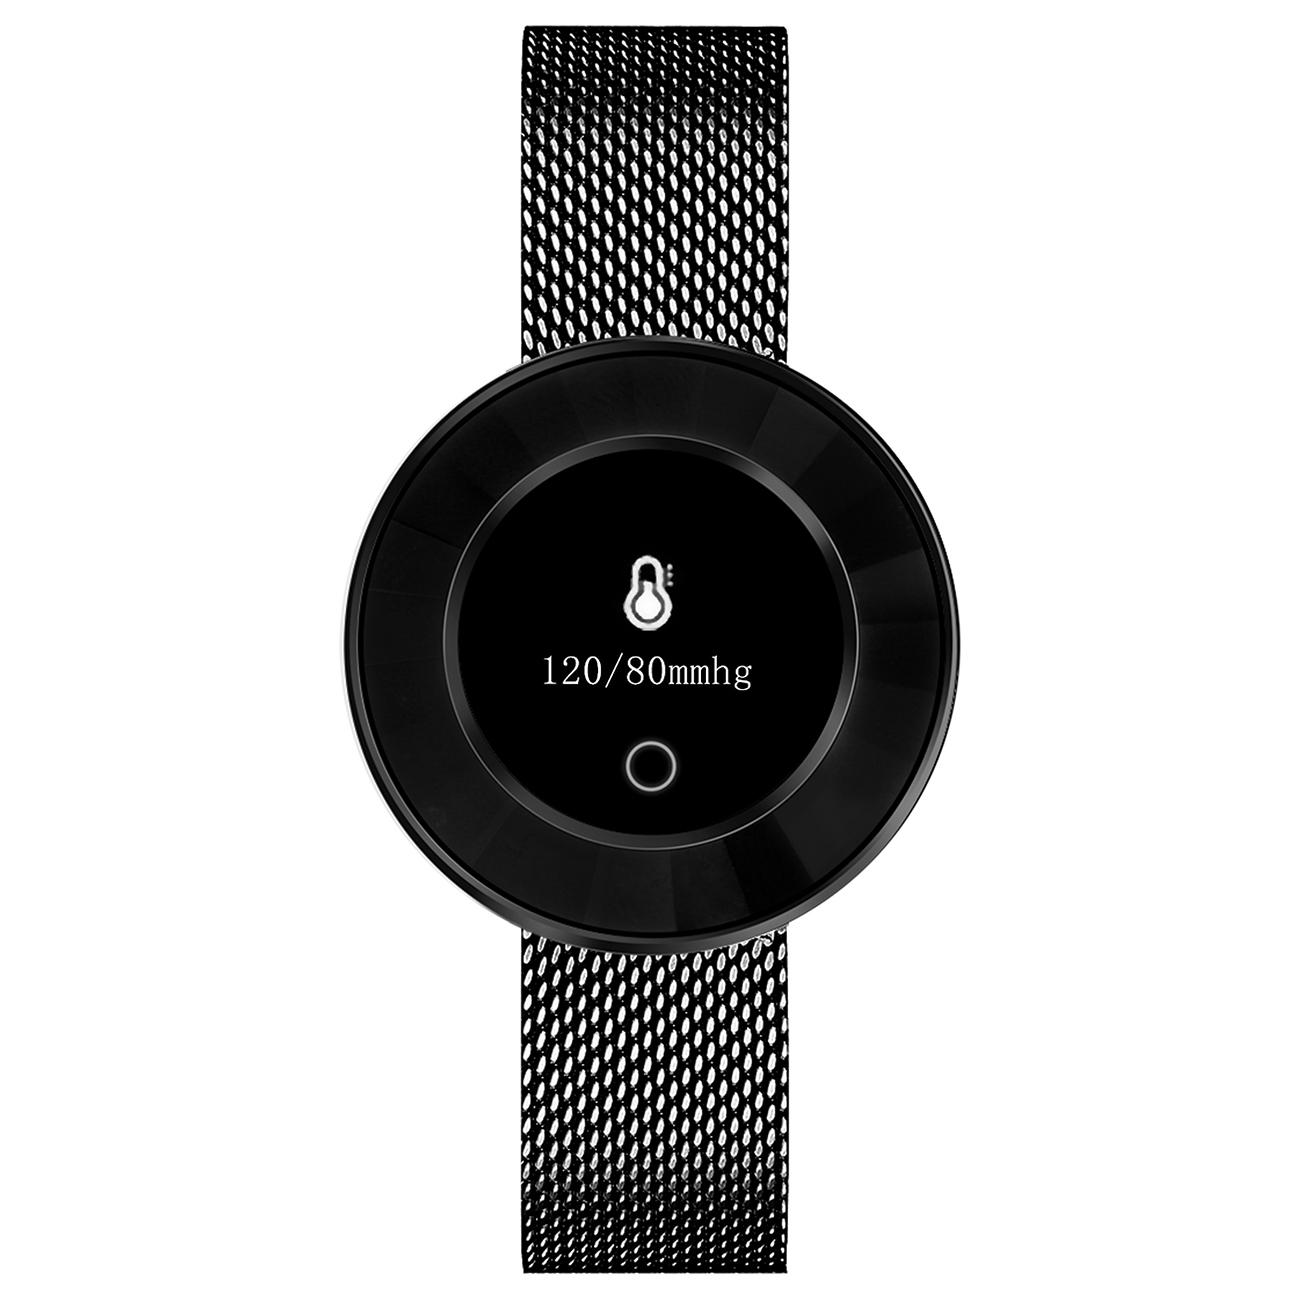 Fitness Tracker, schwarz, Mesh-Armband